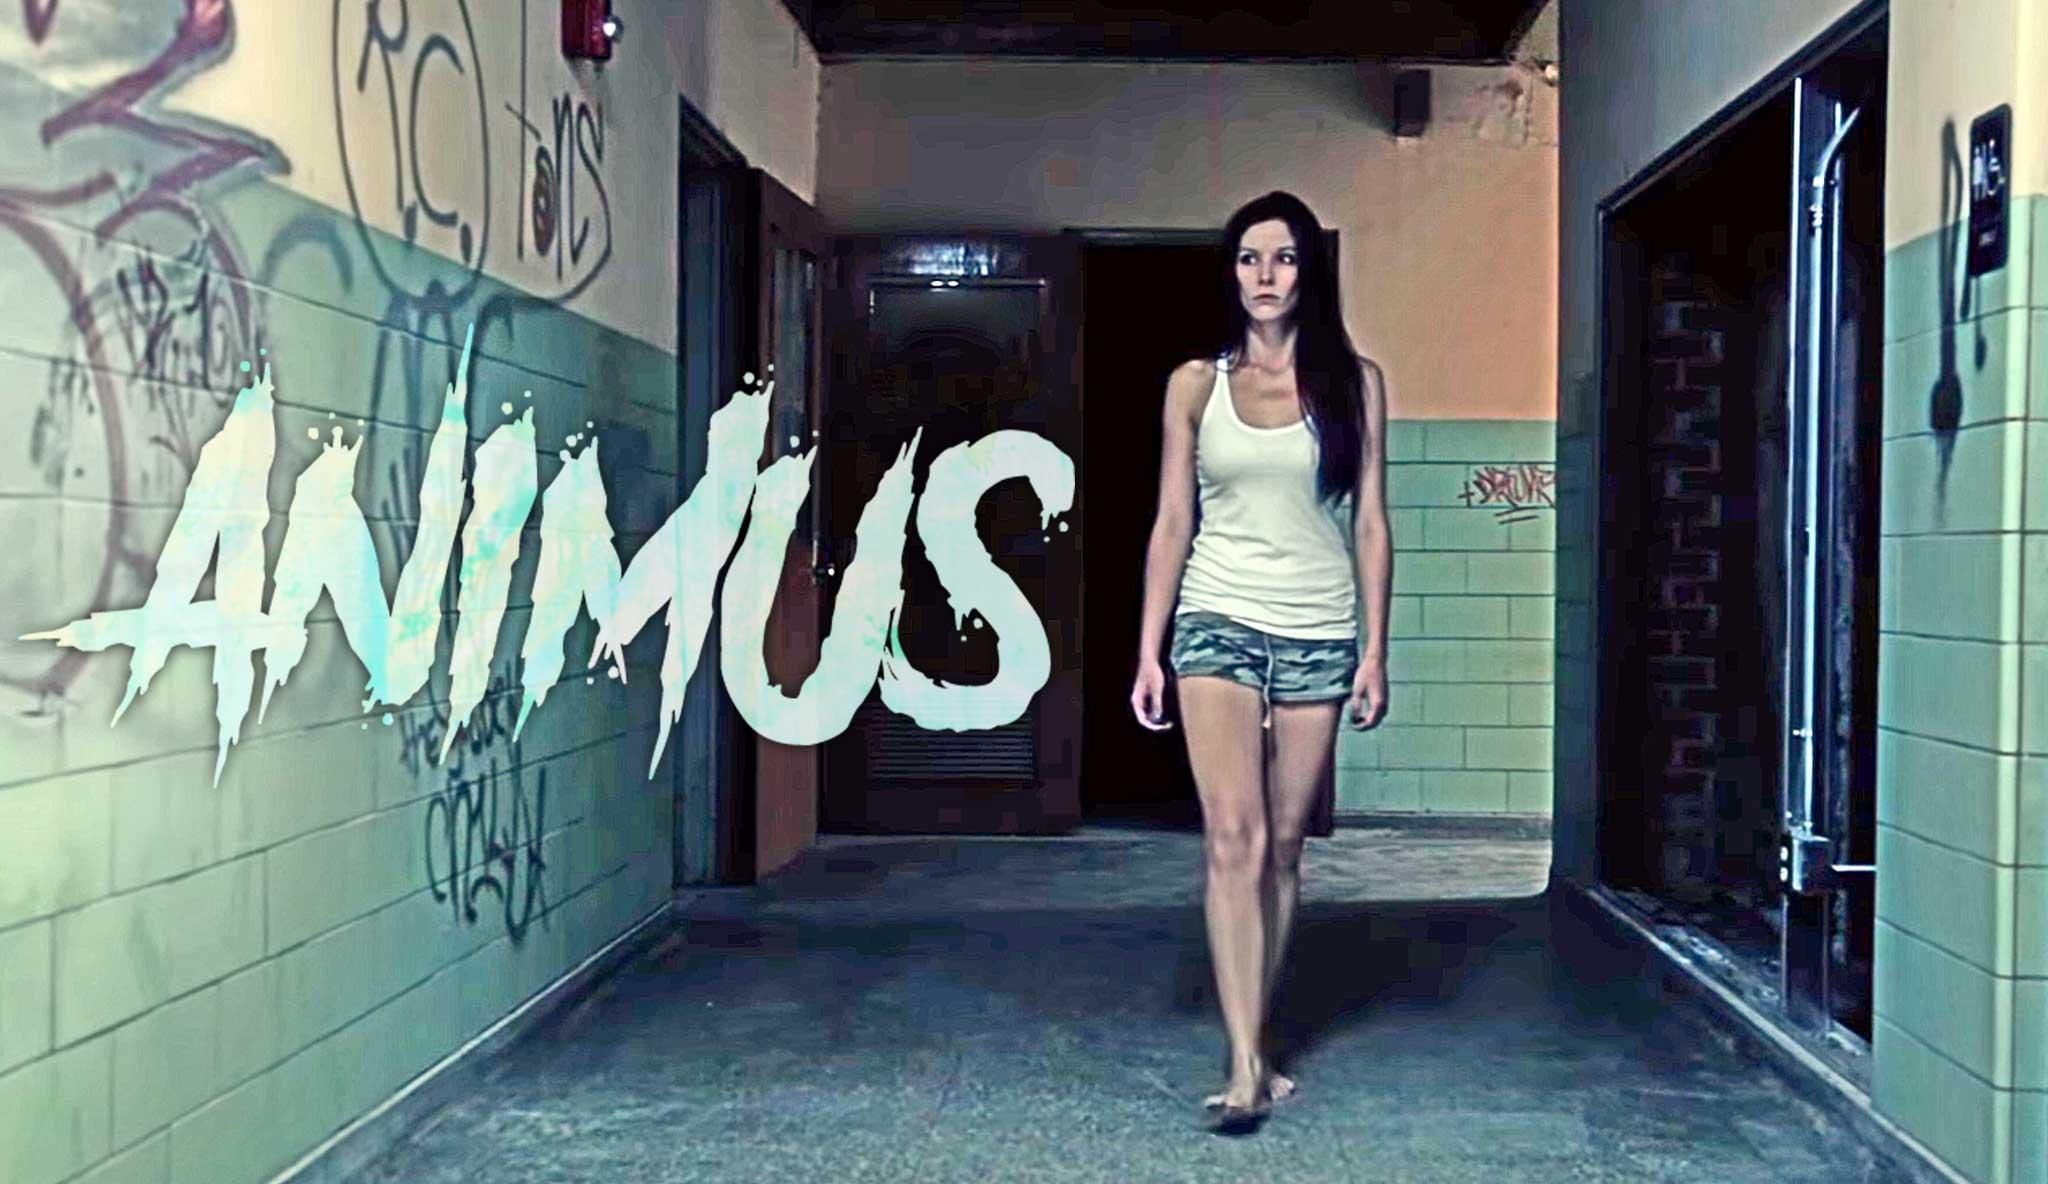 animus-the-new-maneater-2\header.jpg